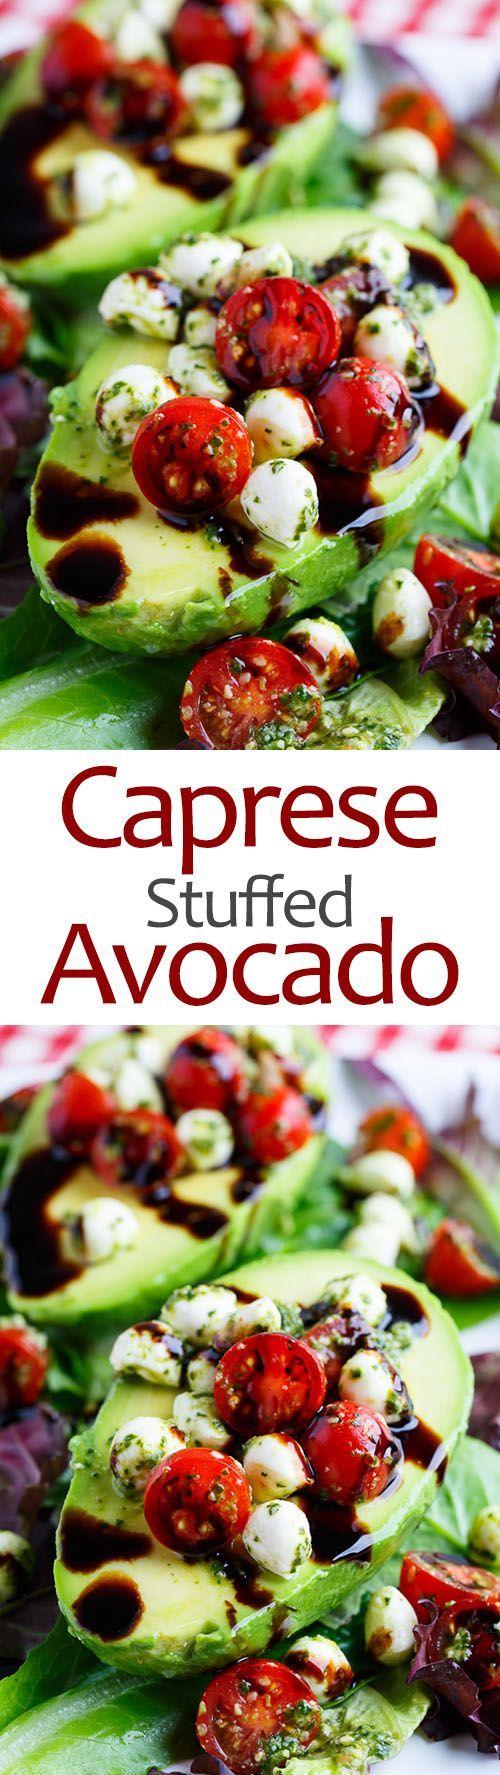 Caprese Stuffed Avocados | Closet Cooking